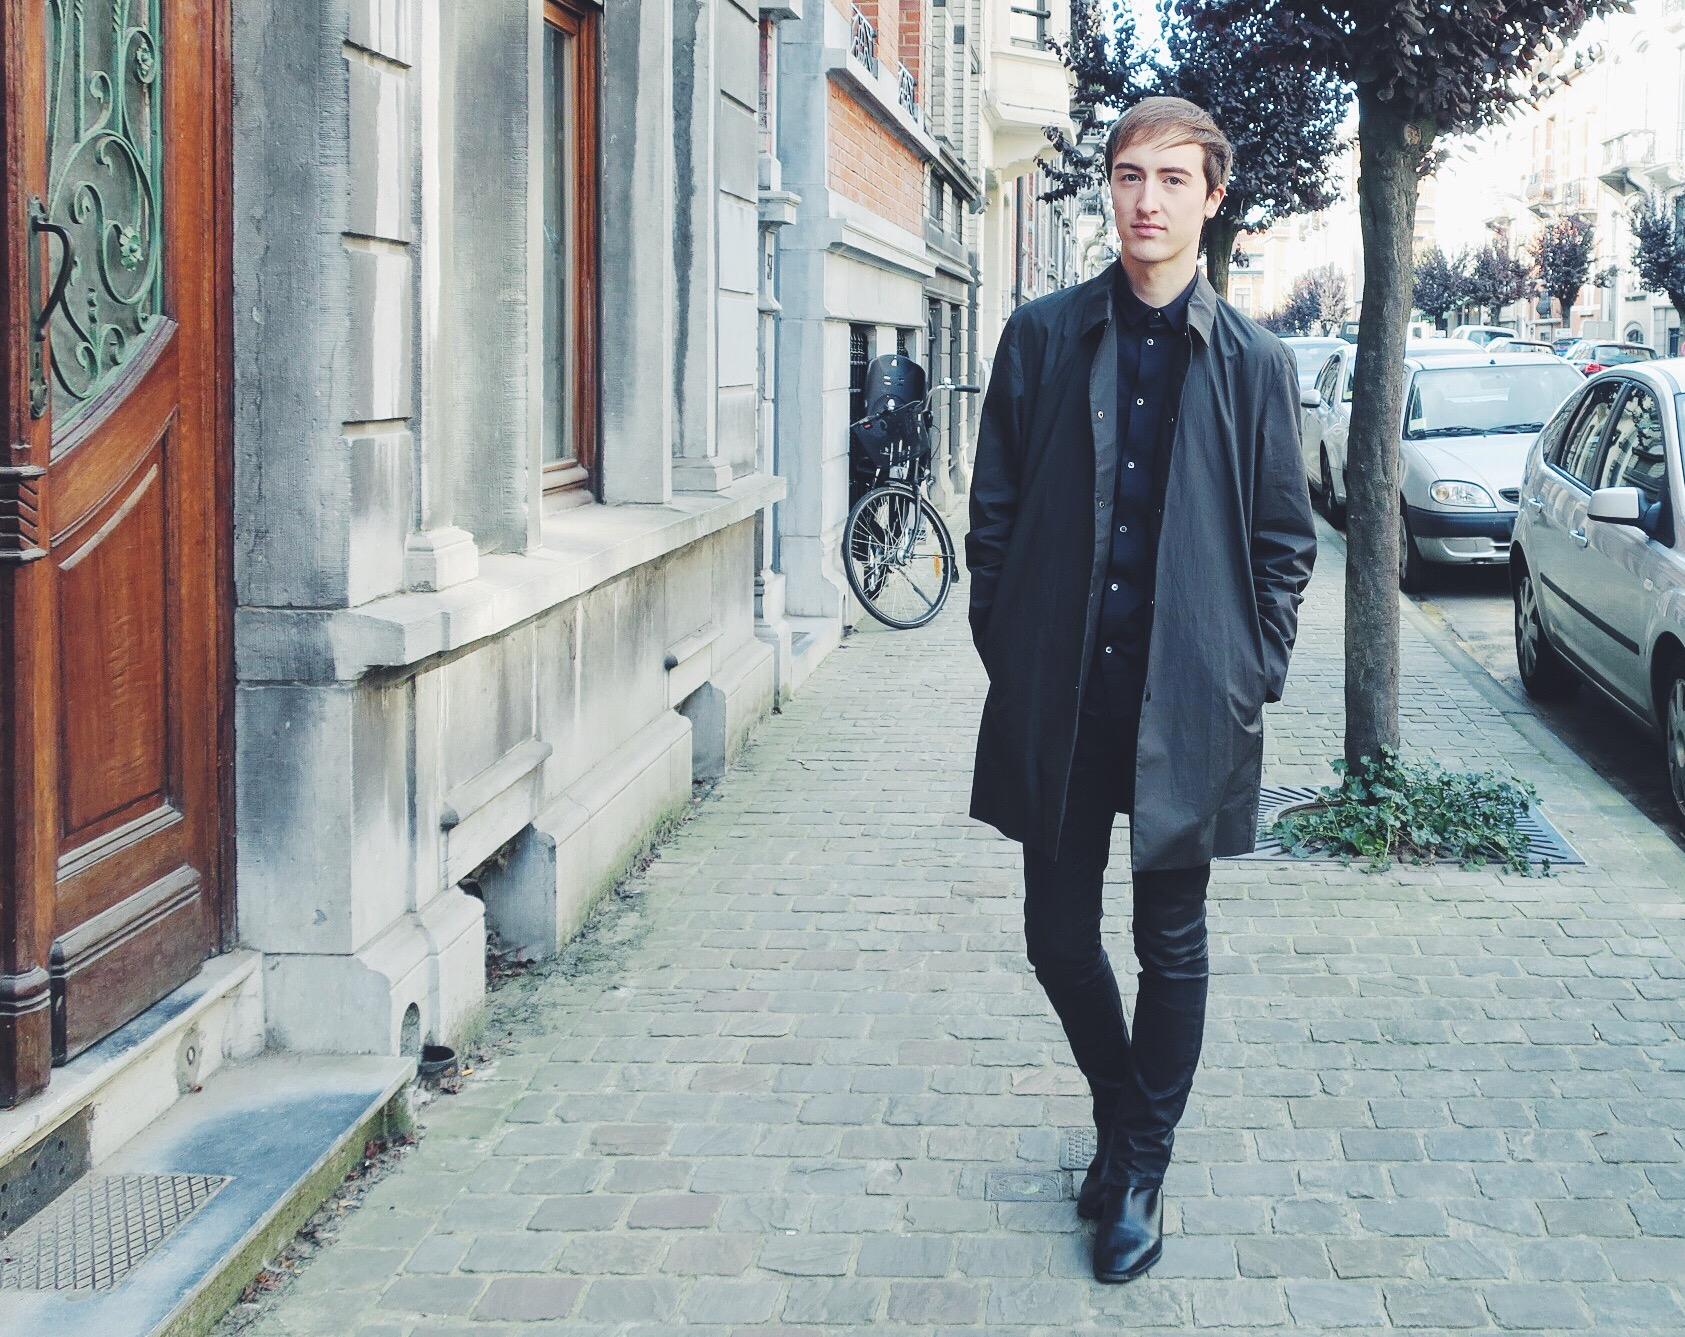 Cos jacket - Cos shirt - Asos trousers - Zara boots